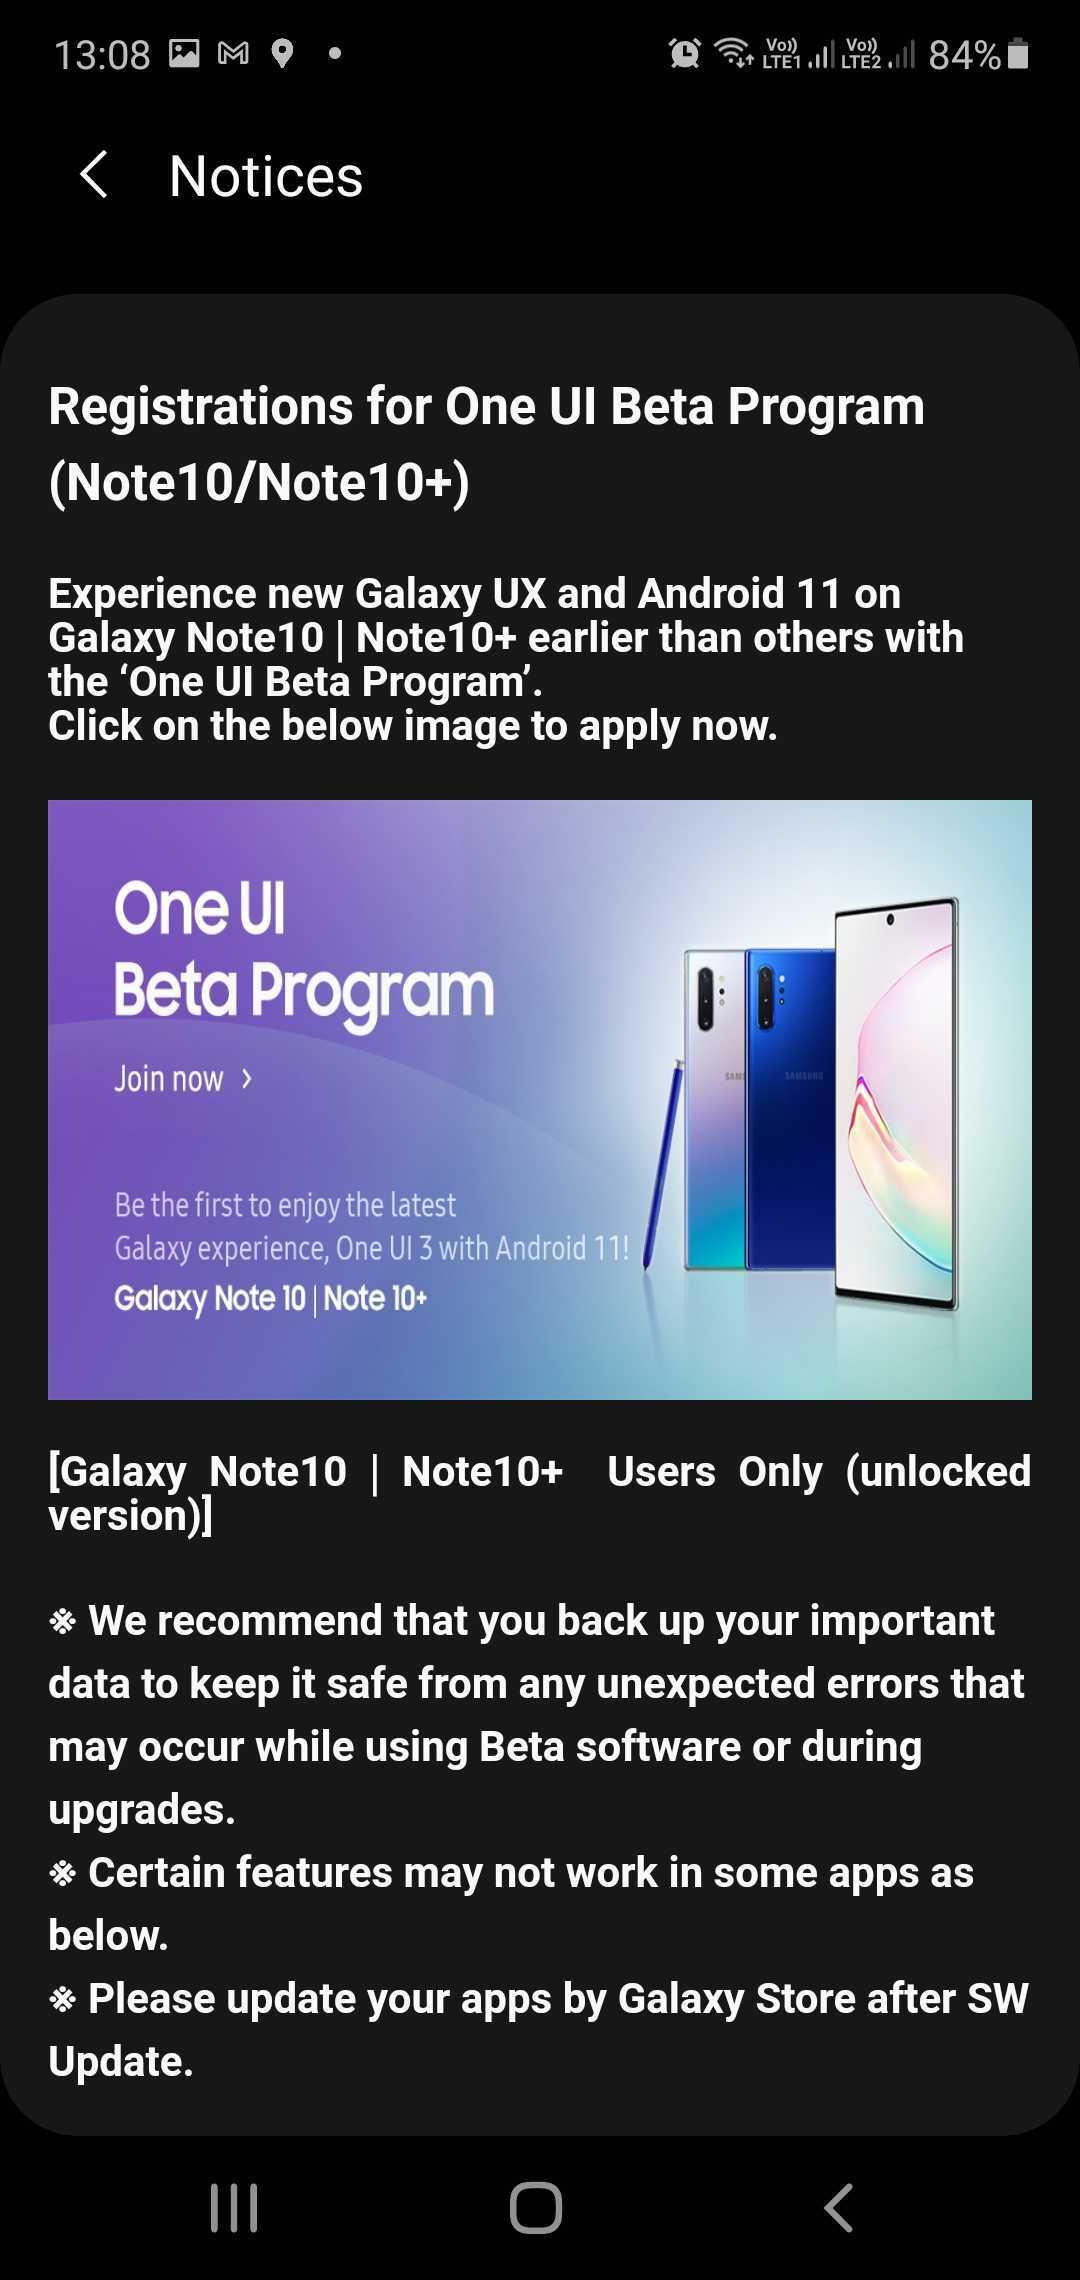 Samsung Galaxy Note 10 Plus One UI 3.0 Beta Update Registration India